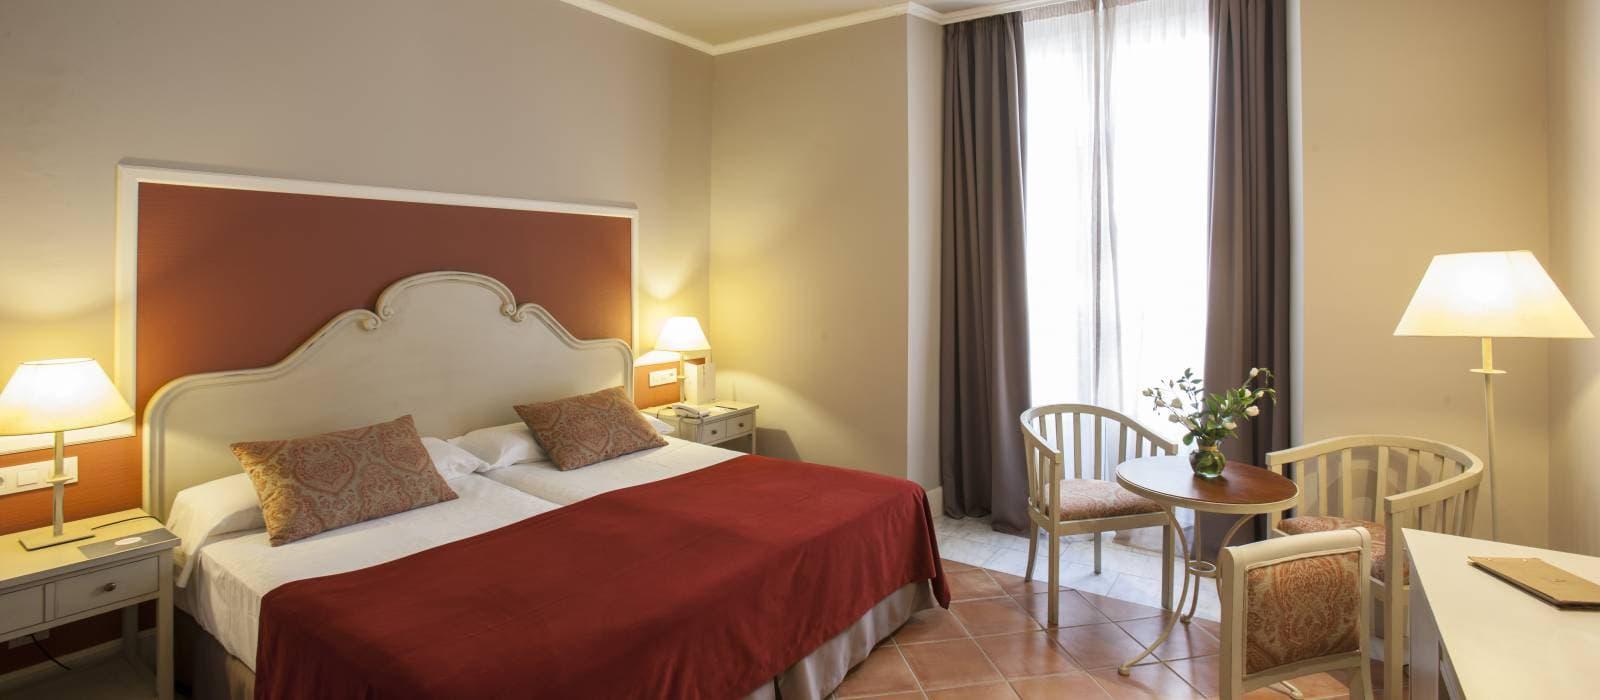 Hotel Sevilla La Rábida - Vincci Hoteles